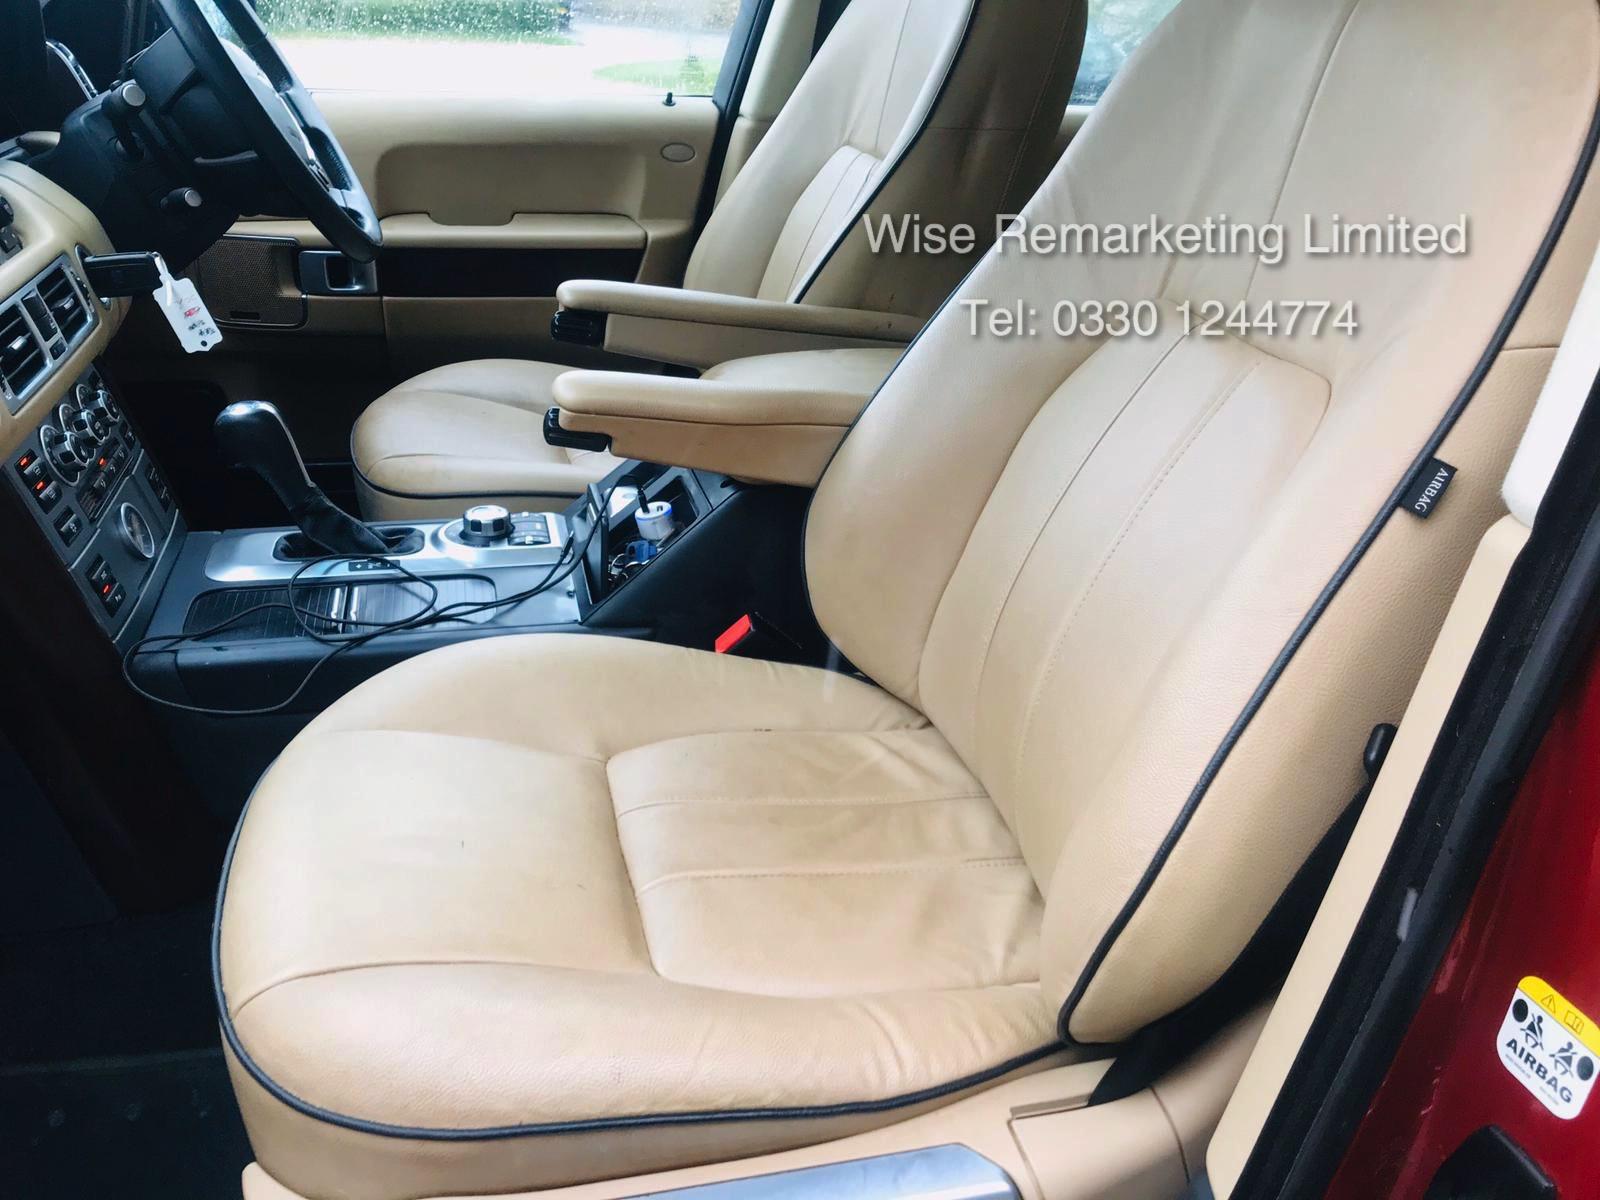 Range Rover Vogue 3.6 TDV8 HSE Auto - 2010 Model - Cream Leather - Service History - - Image 16 of 28